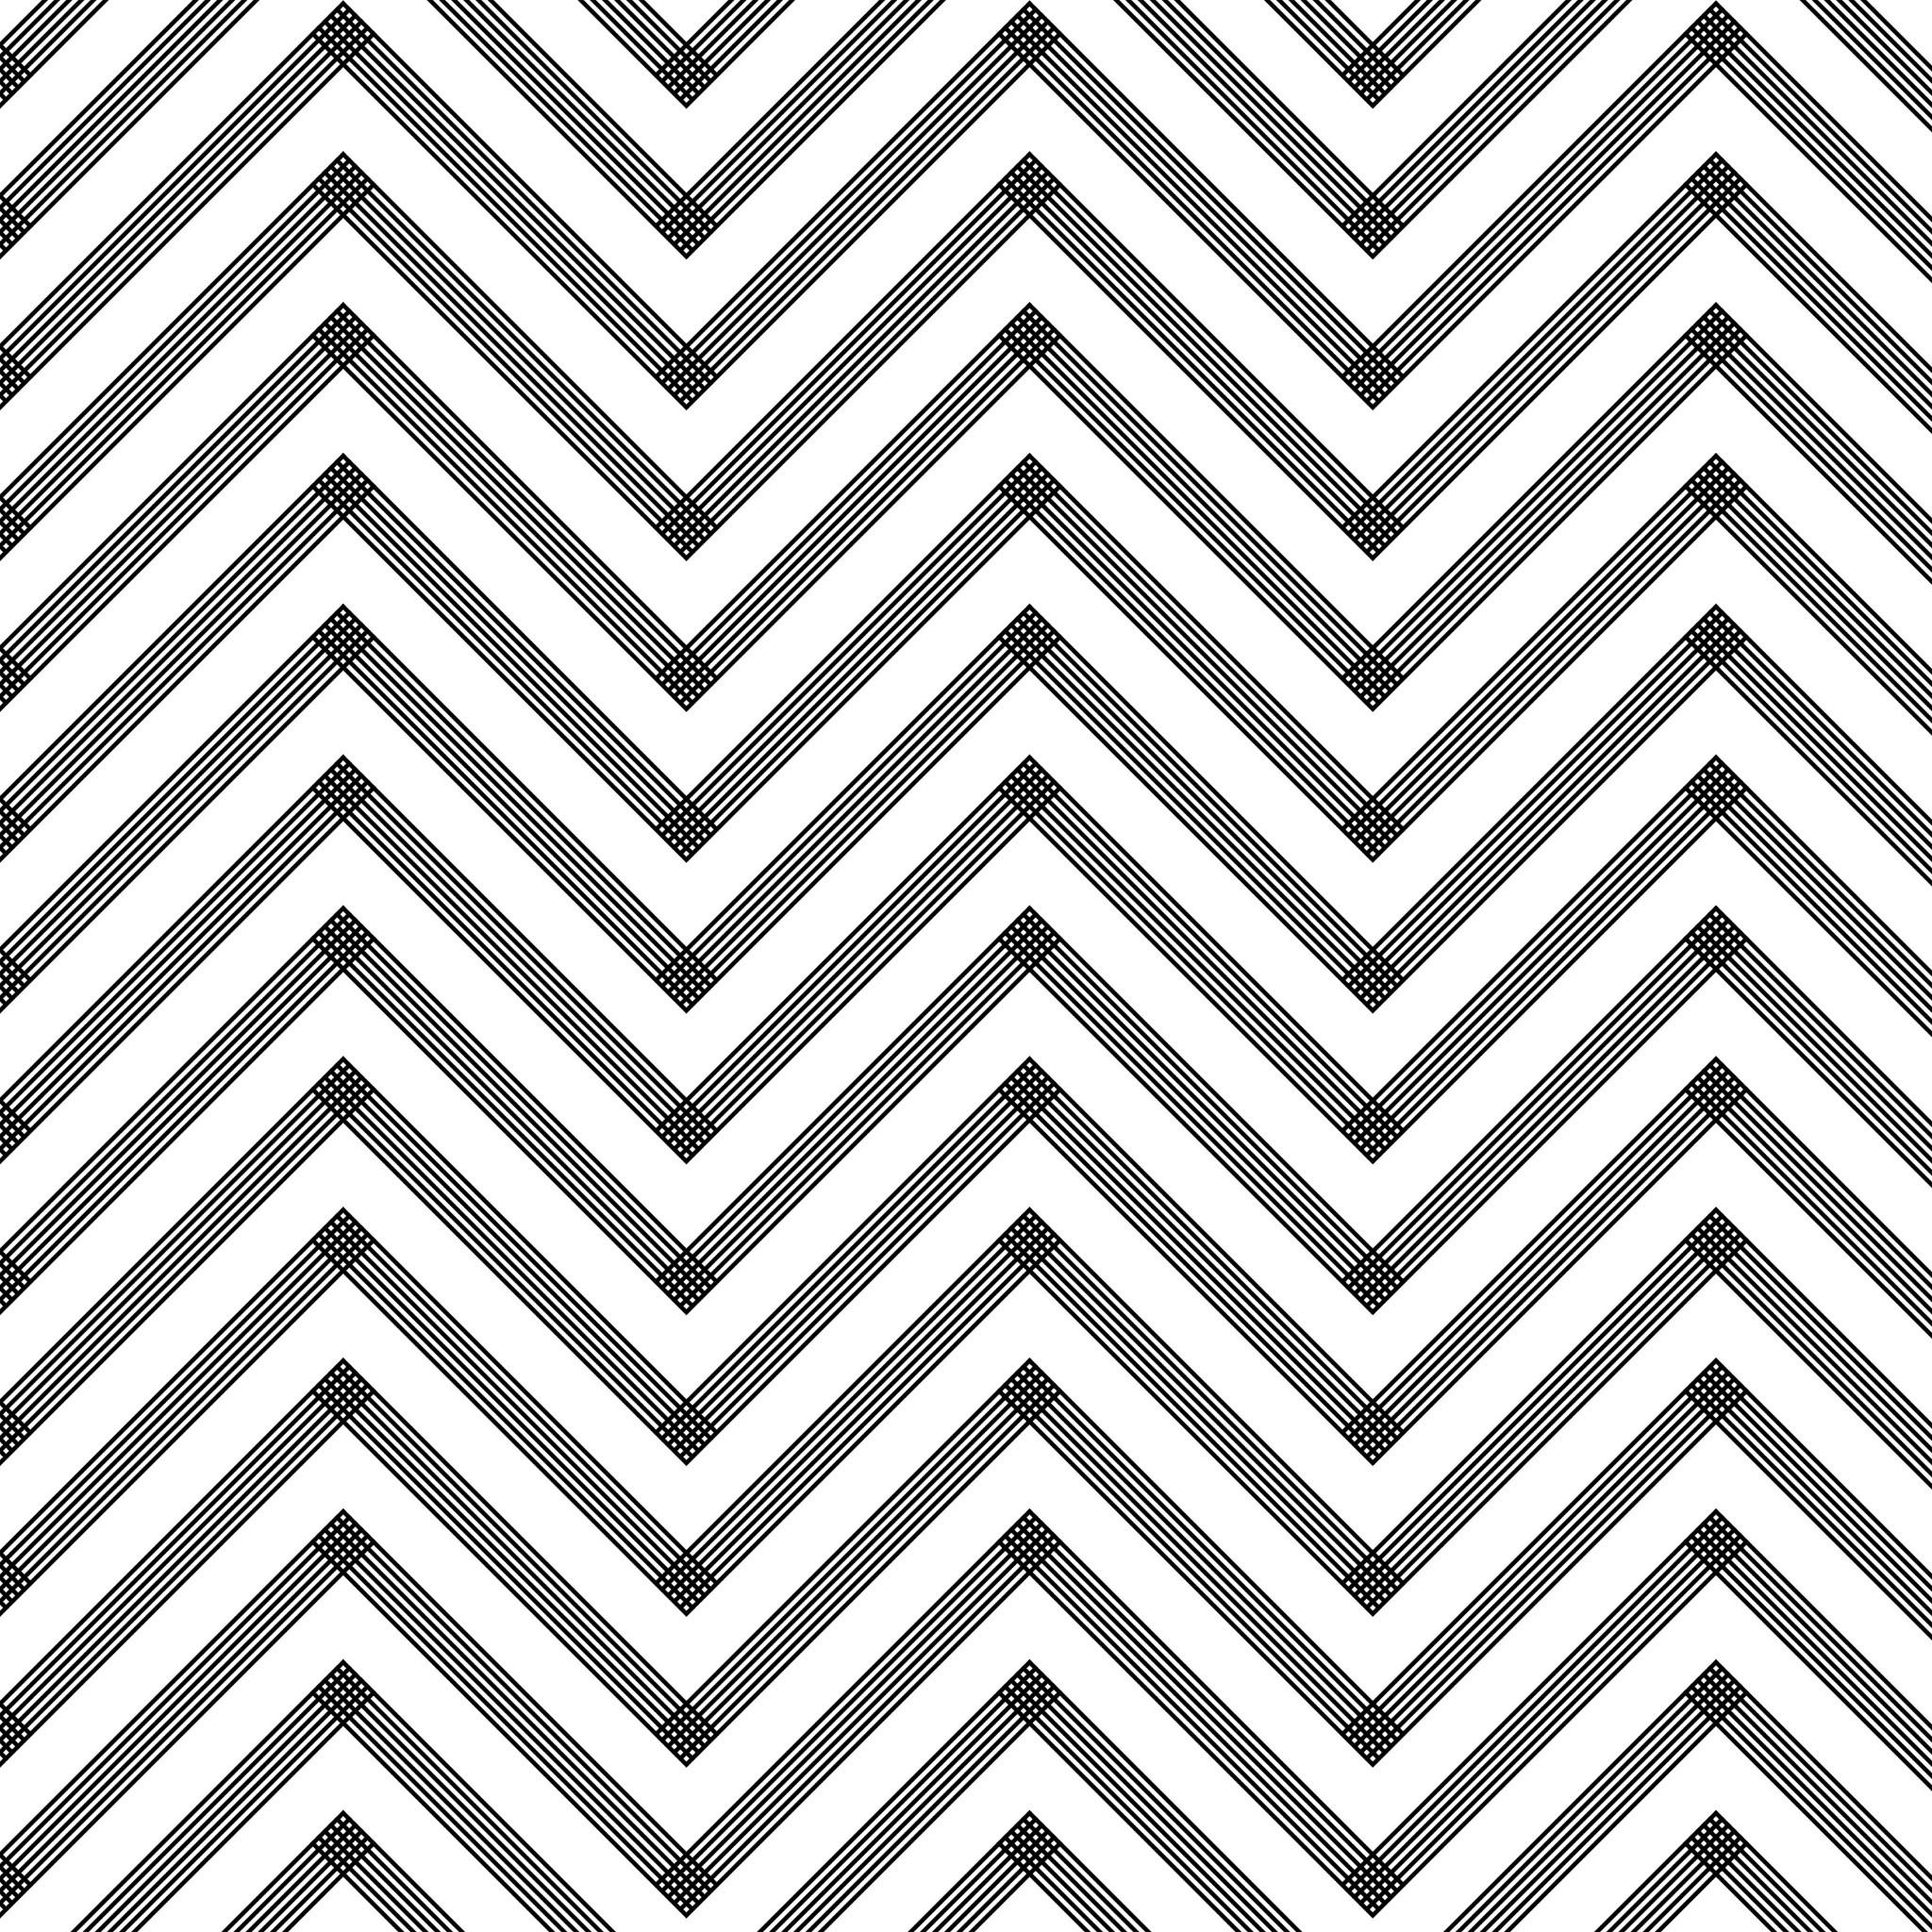 Black And White Chevron Wallpaper Wallpapersafari